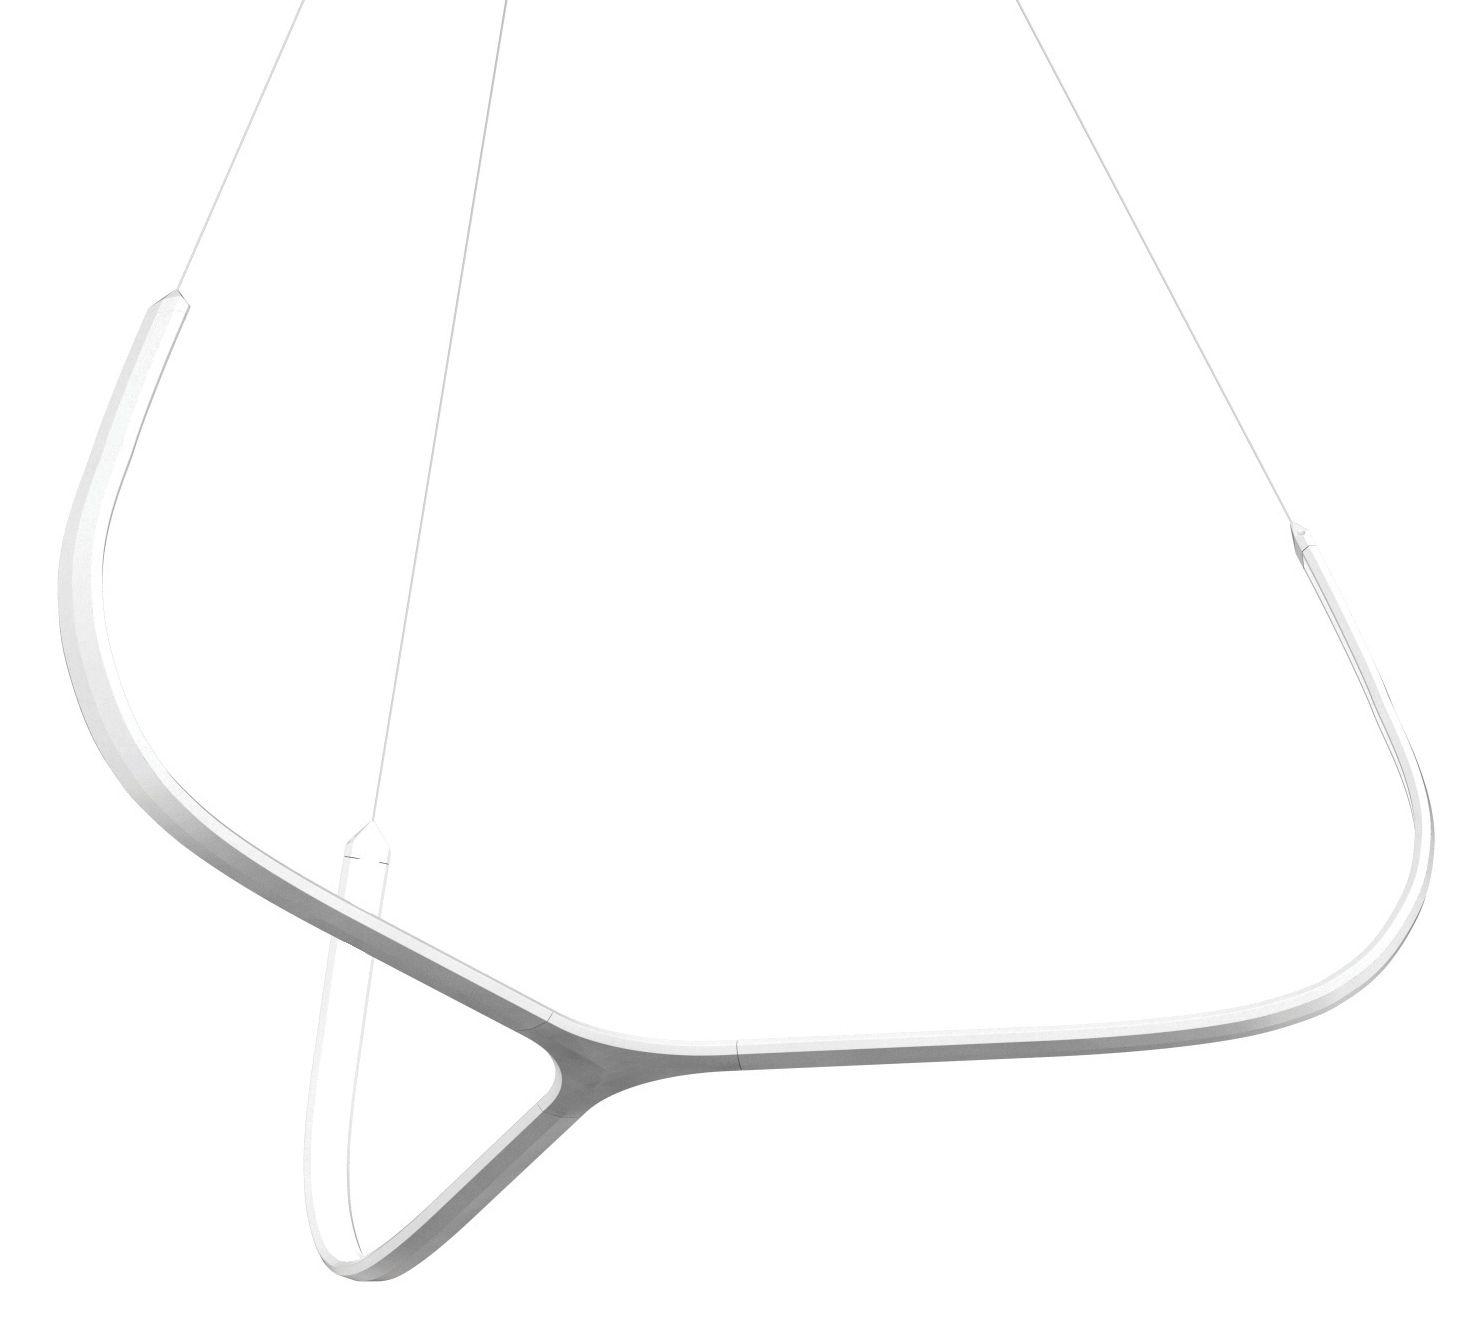 Leuchten - Pendelleuchten - Alya Pendelleuchte LED / Ø 90 cm - Nemo - Weiß - bemaltes Aluminium, Methacrylate